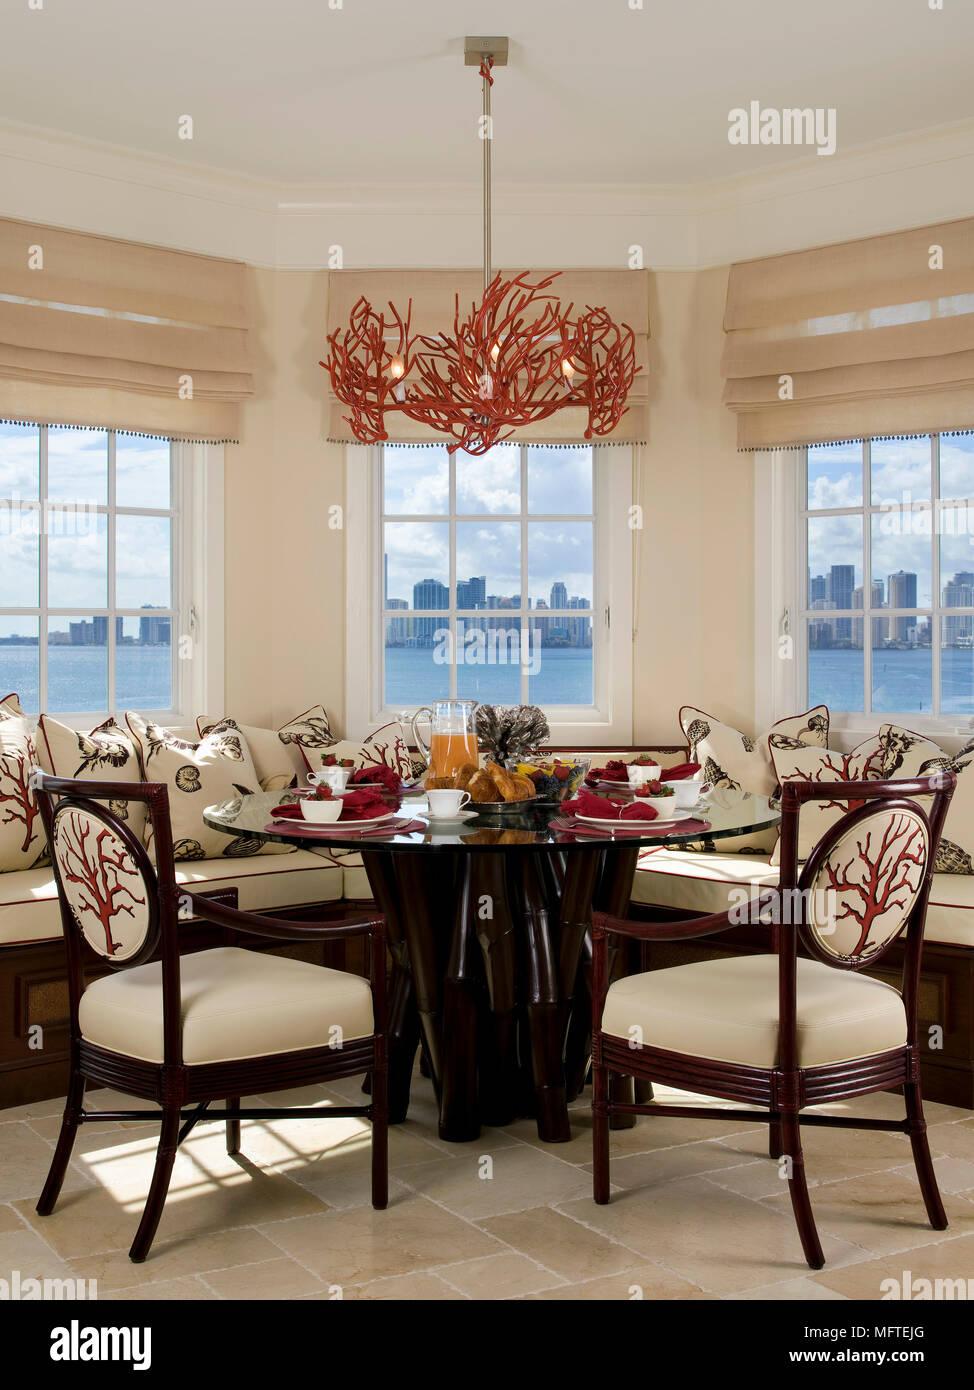 Ceiling light above round table set for dinner in modern dining ...